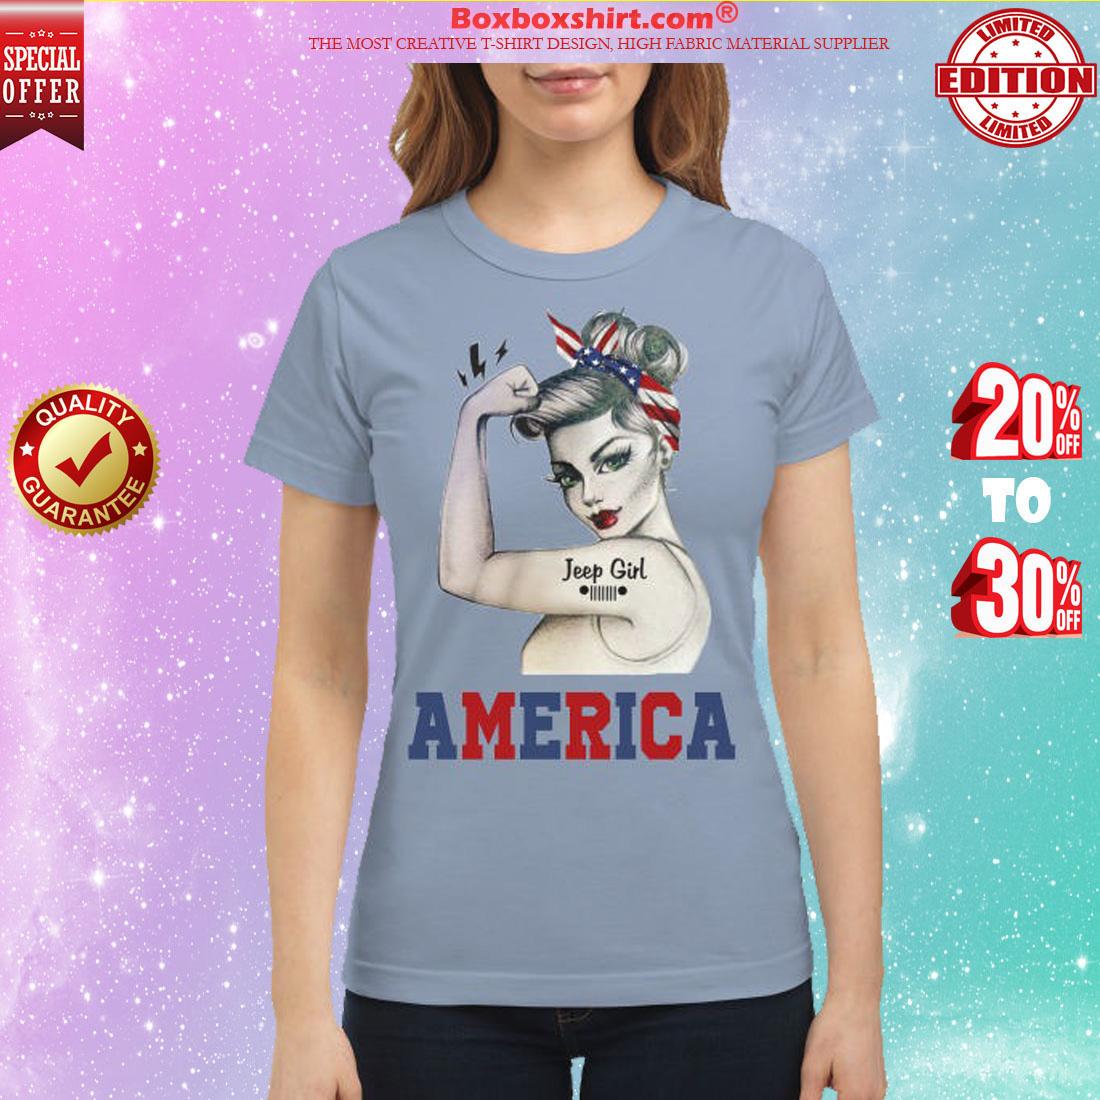 Jeep girl America classic shirt